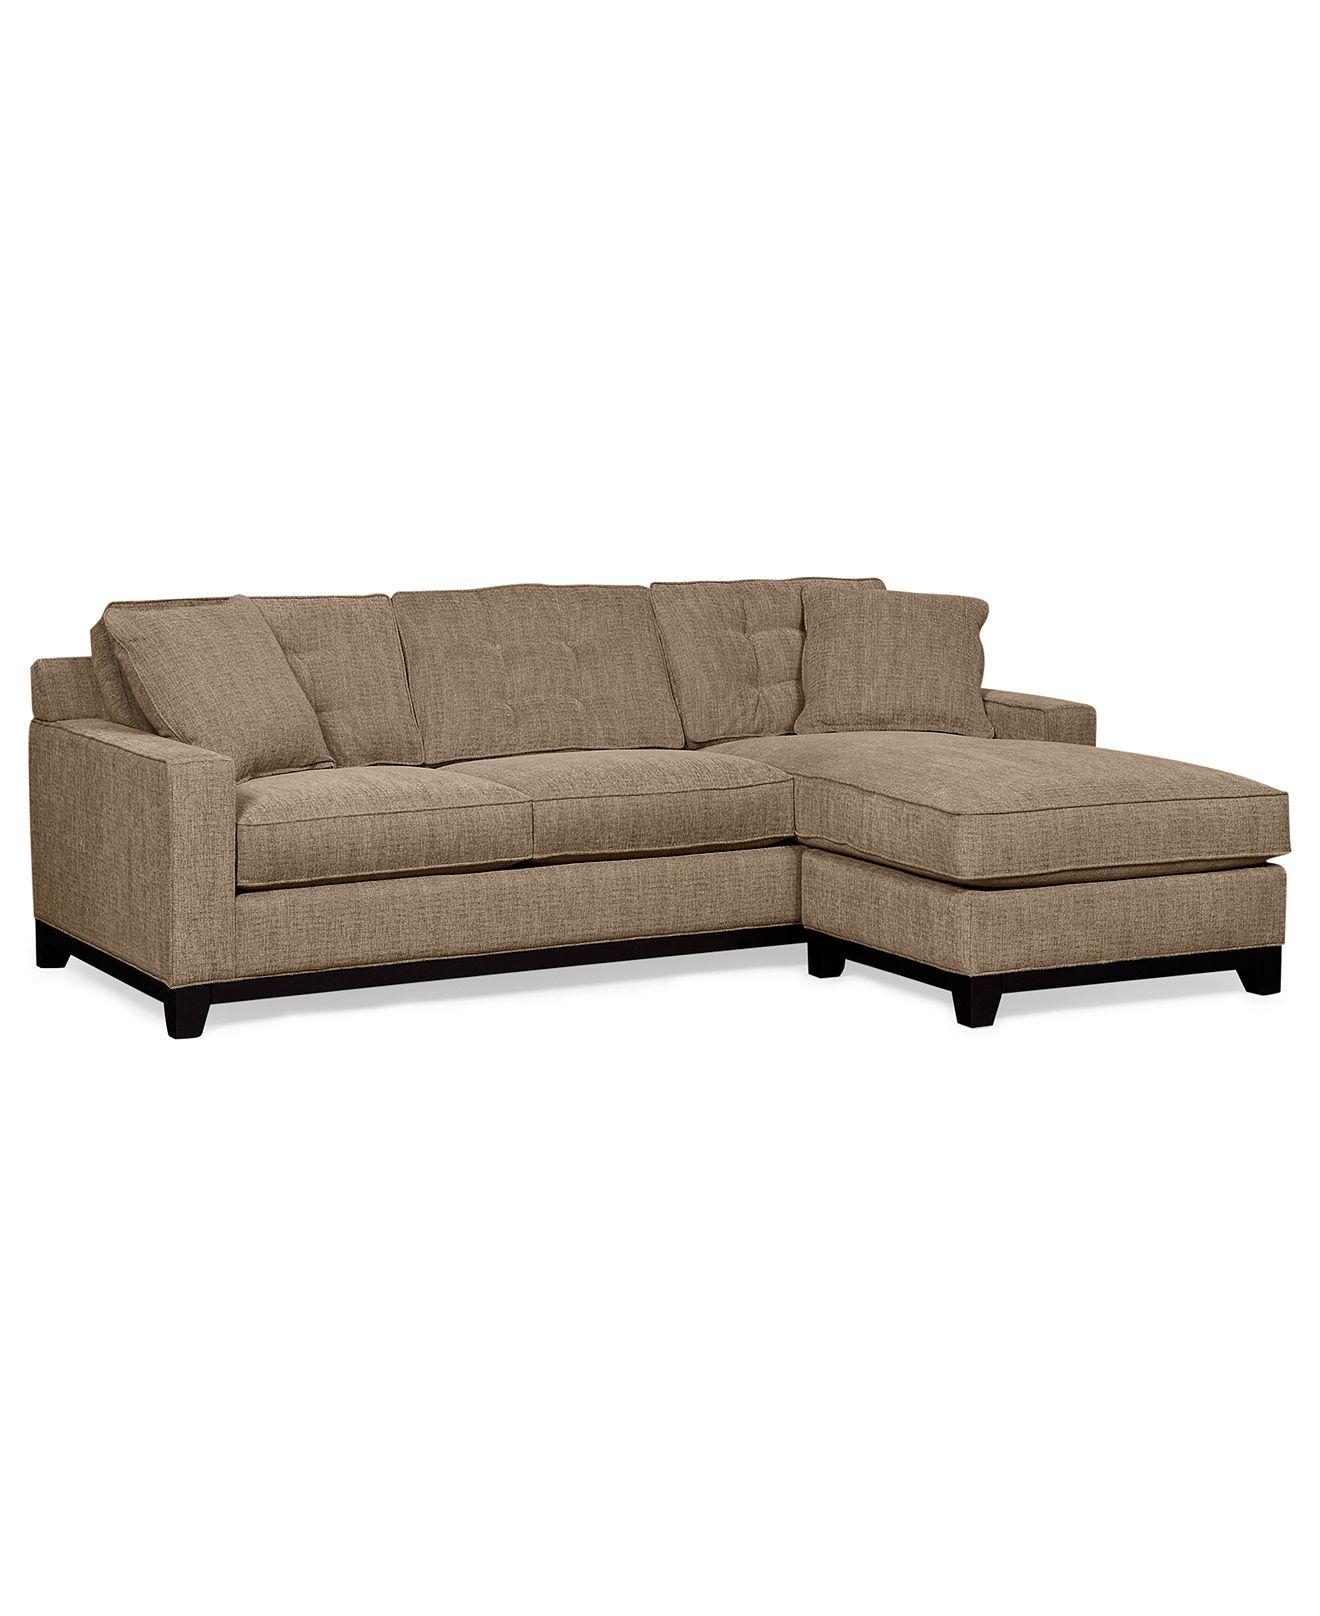 Clarke Fabric Sectional Sofa Bed 2 Piece Queen Sleeper 93 W X 38 D X 29 H Furniture Macy 2 Piece Sectional Sofa Fabric Sectional Sofas Sofa Bed Furniture